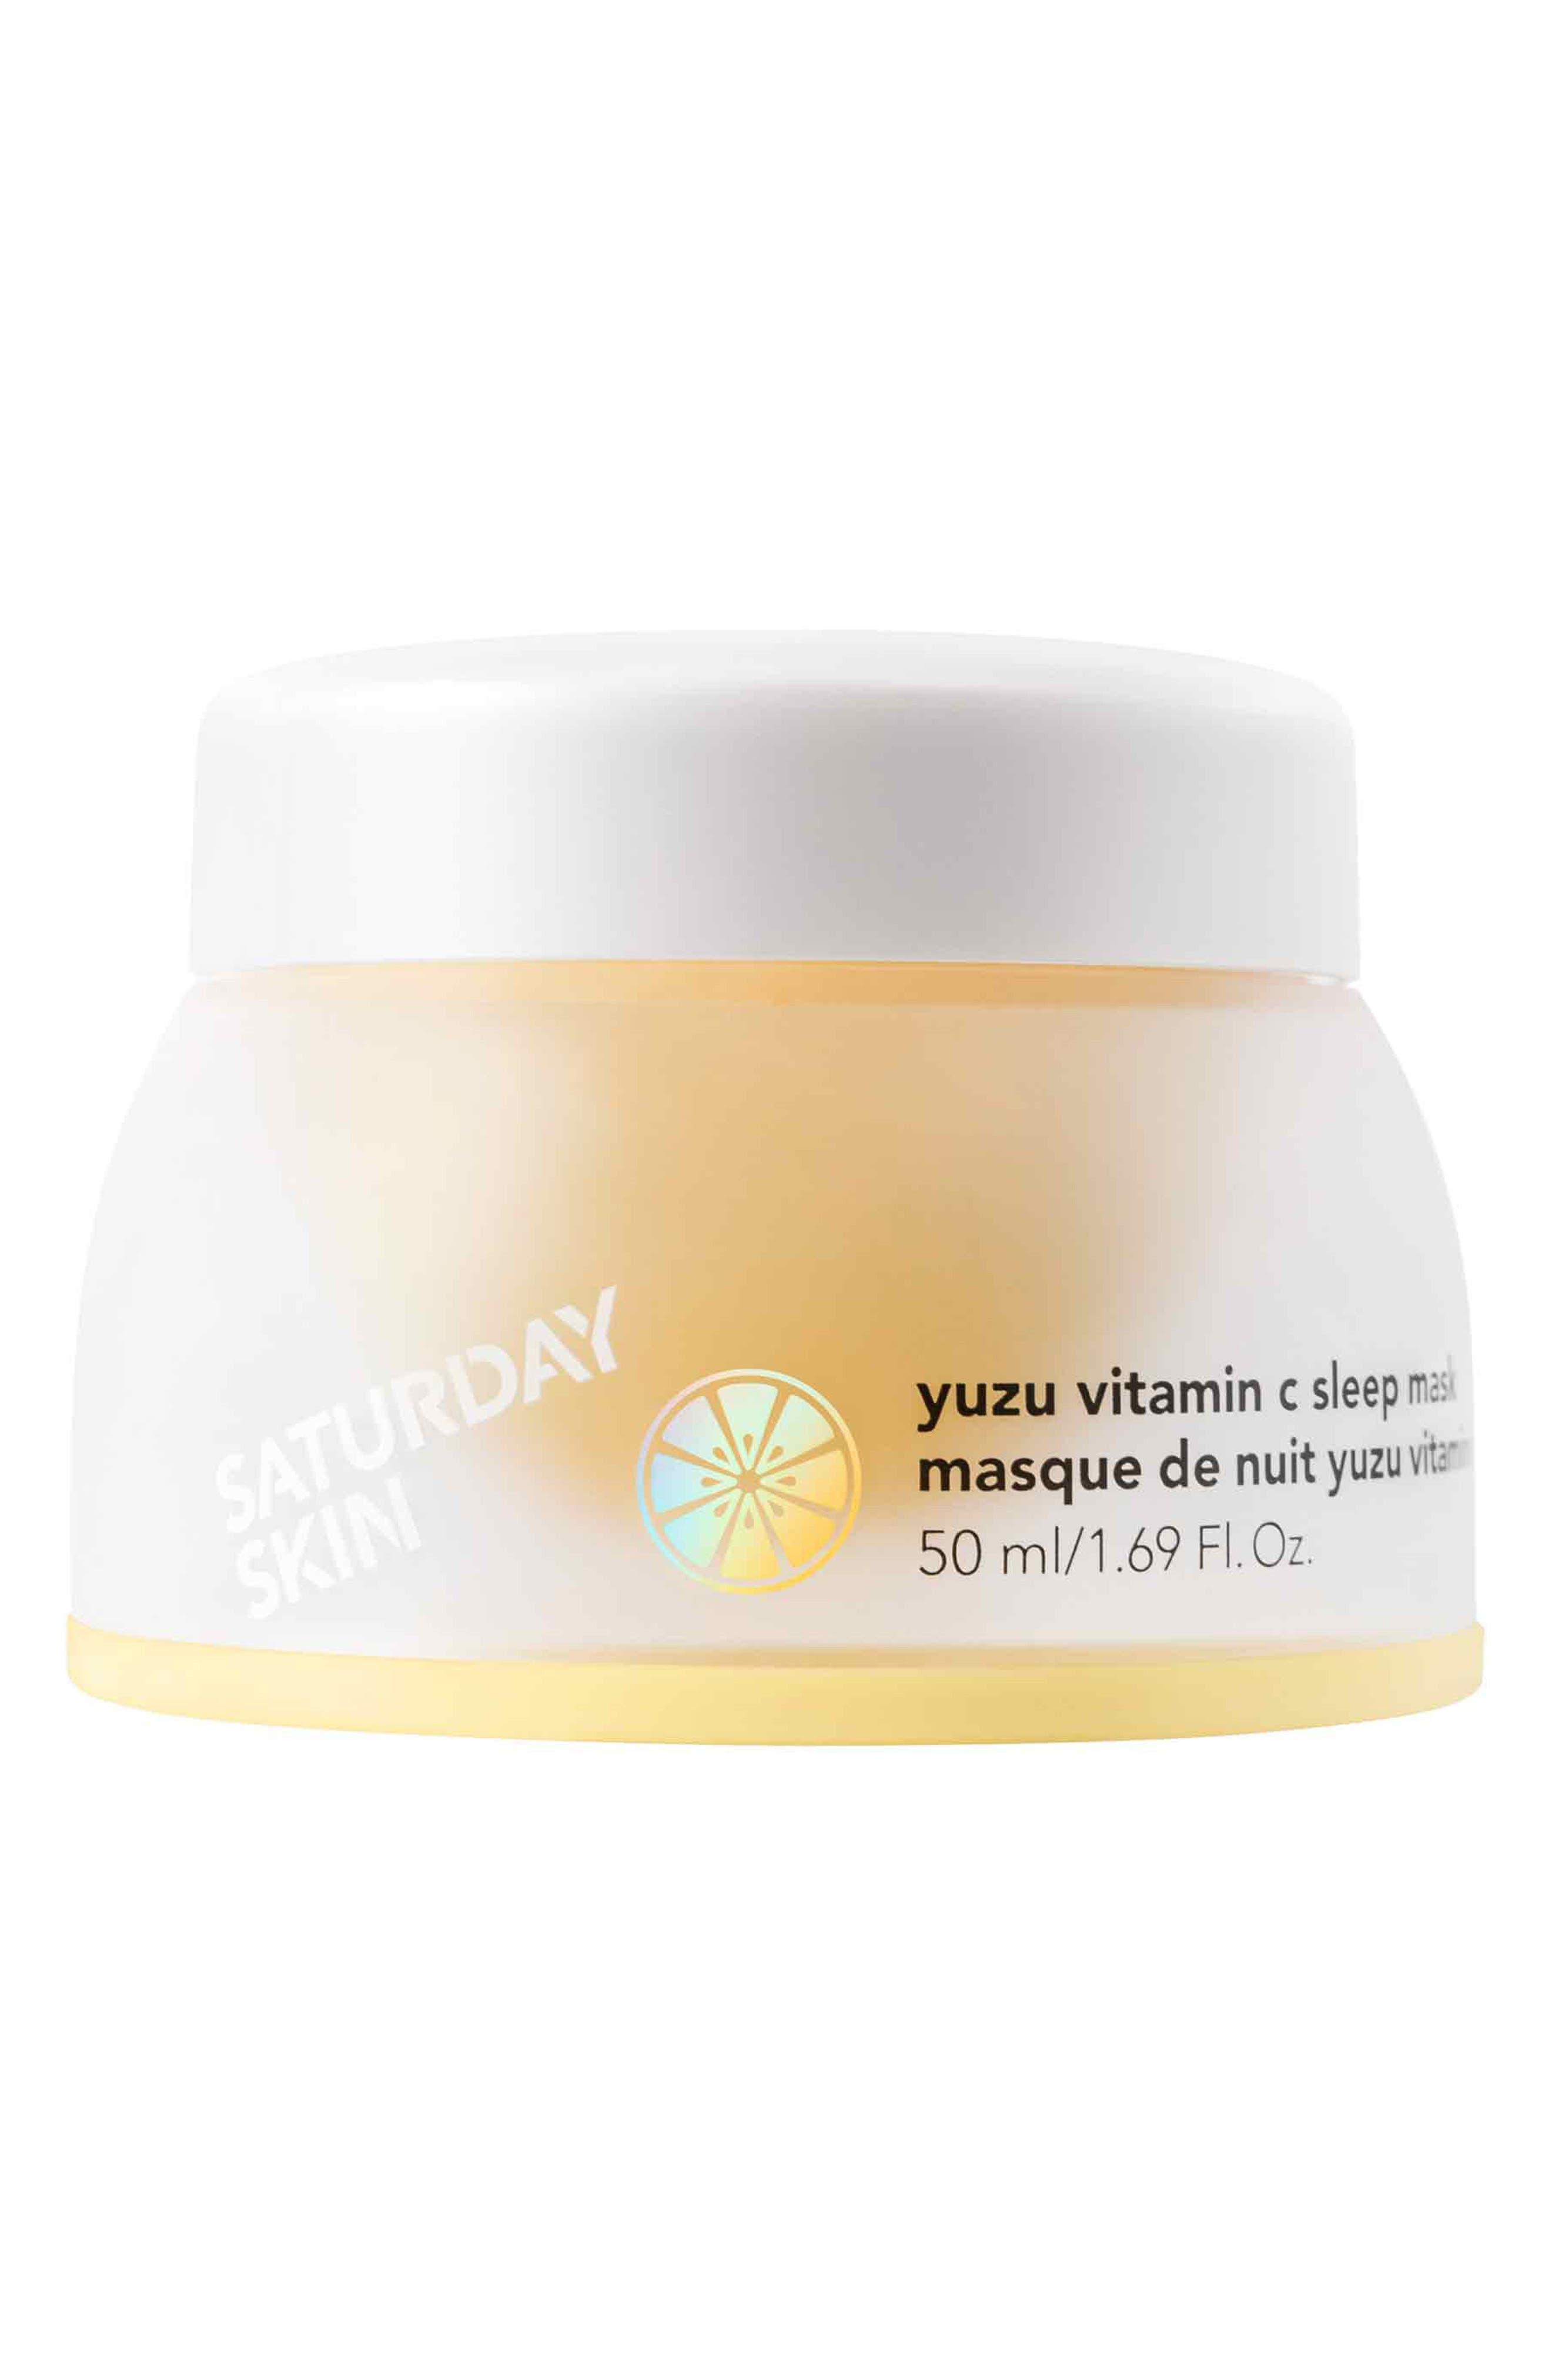 Yuzu Vitamin C Sleep Mask | Nordstrom